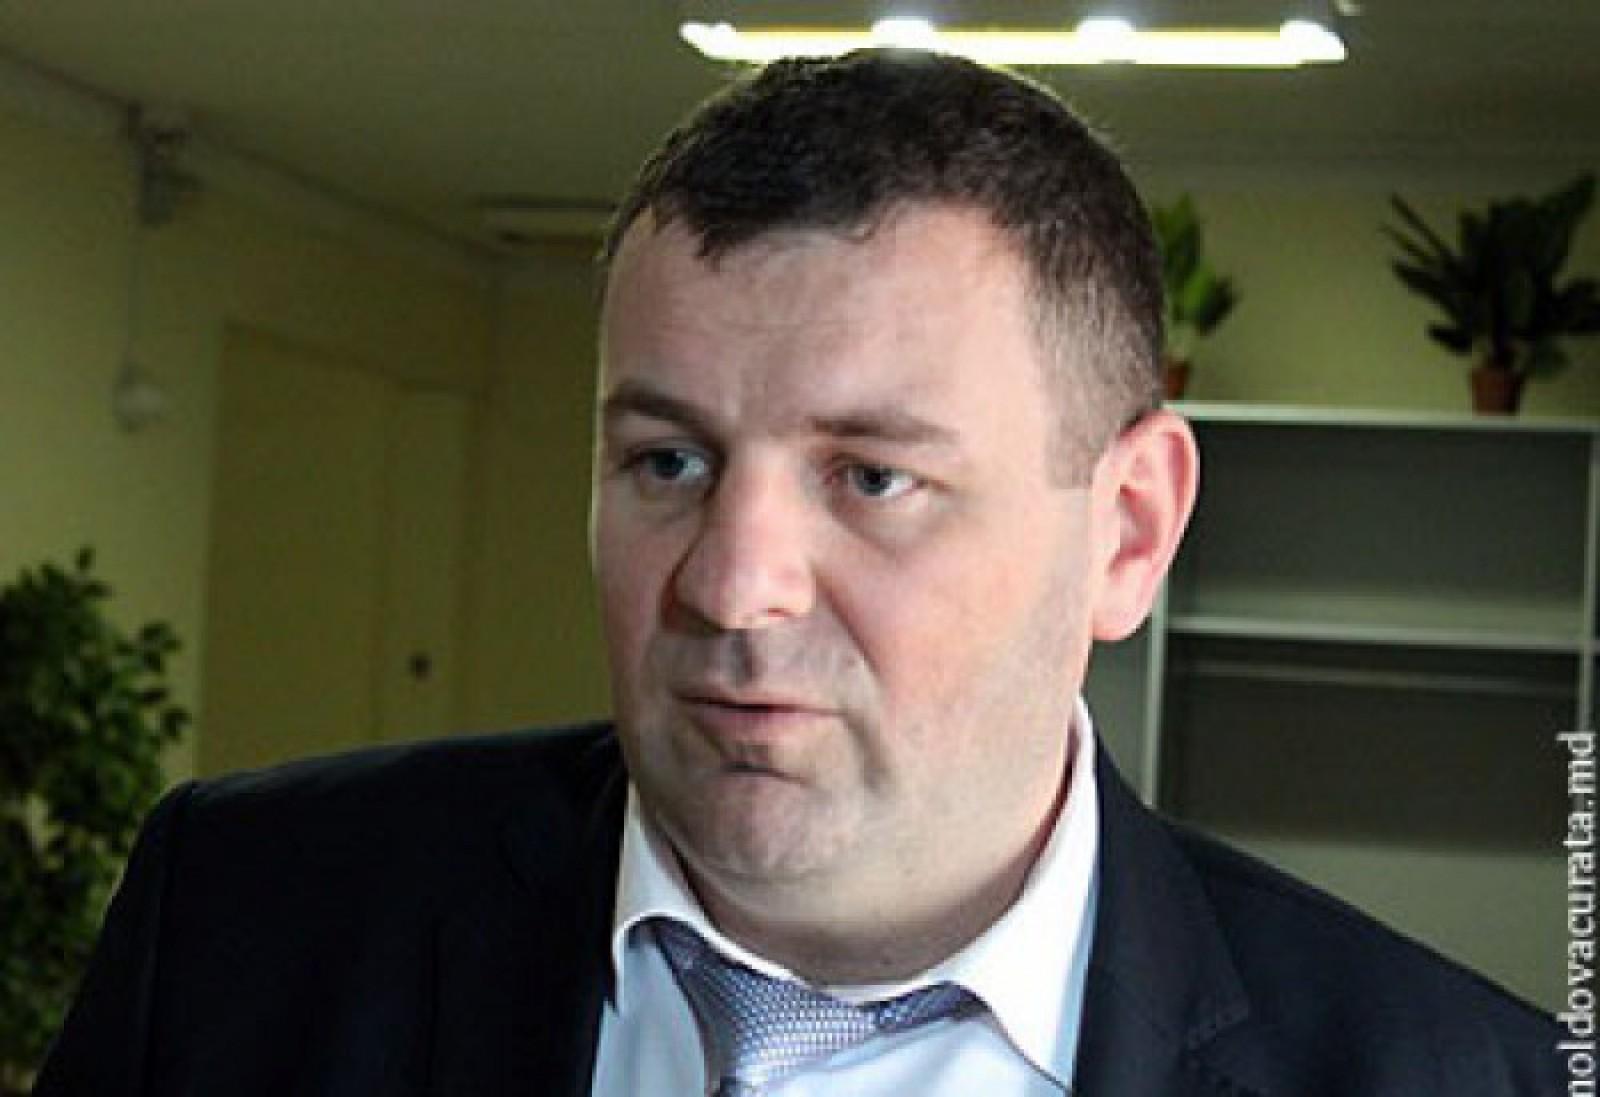 Lilian Chișca va fi propus lui Dodon la funcția de vicepreședinte al ANI